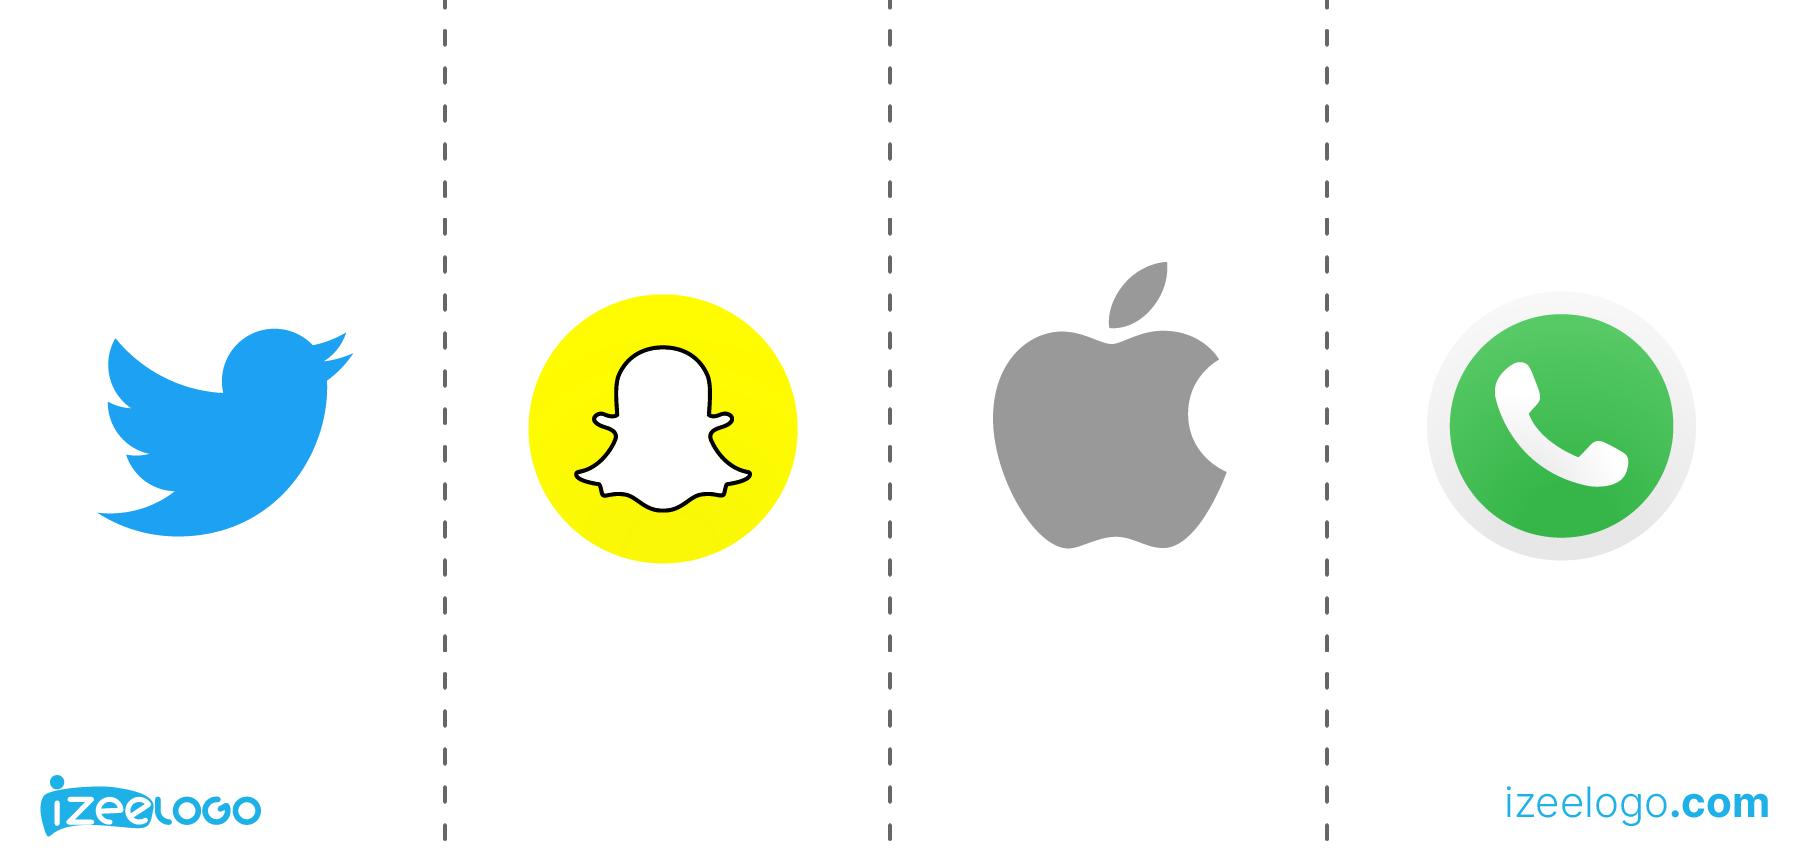 Logo pictogramme : logo Apple PNG, logo Twitter PNG, logo WhatsApp PNG et logo Snapchat PNG.